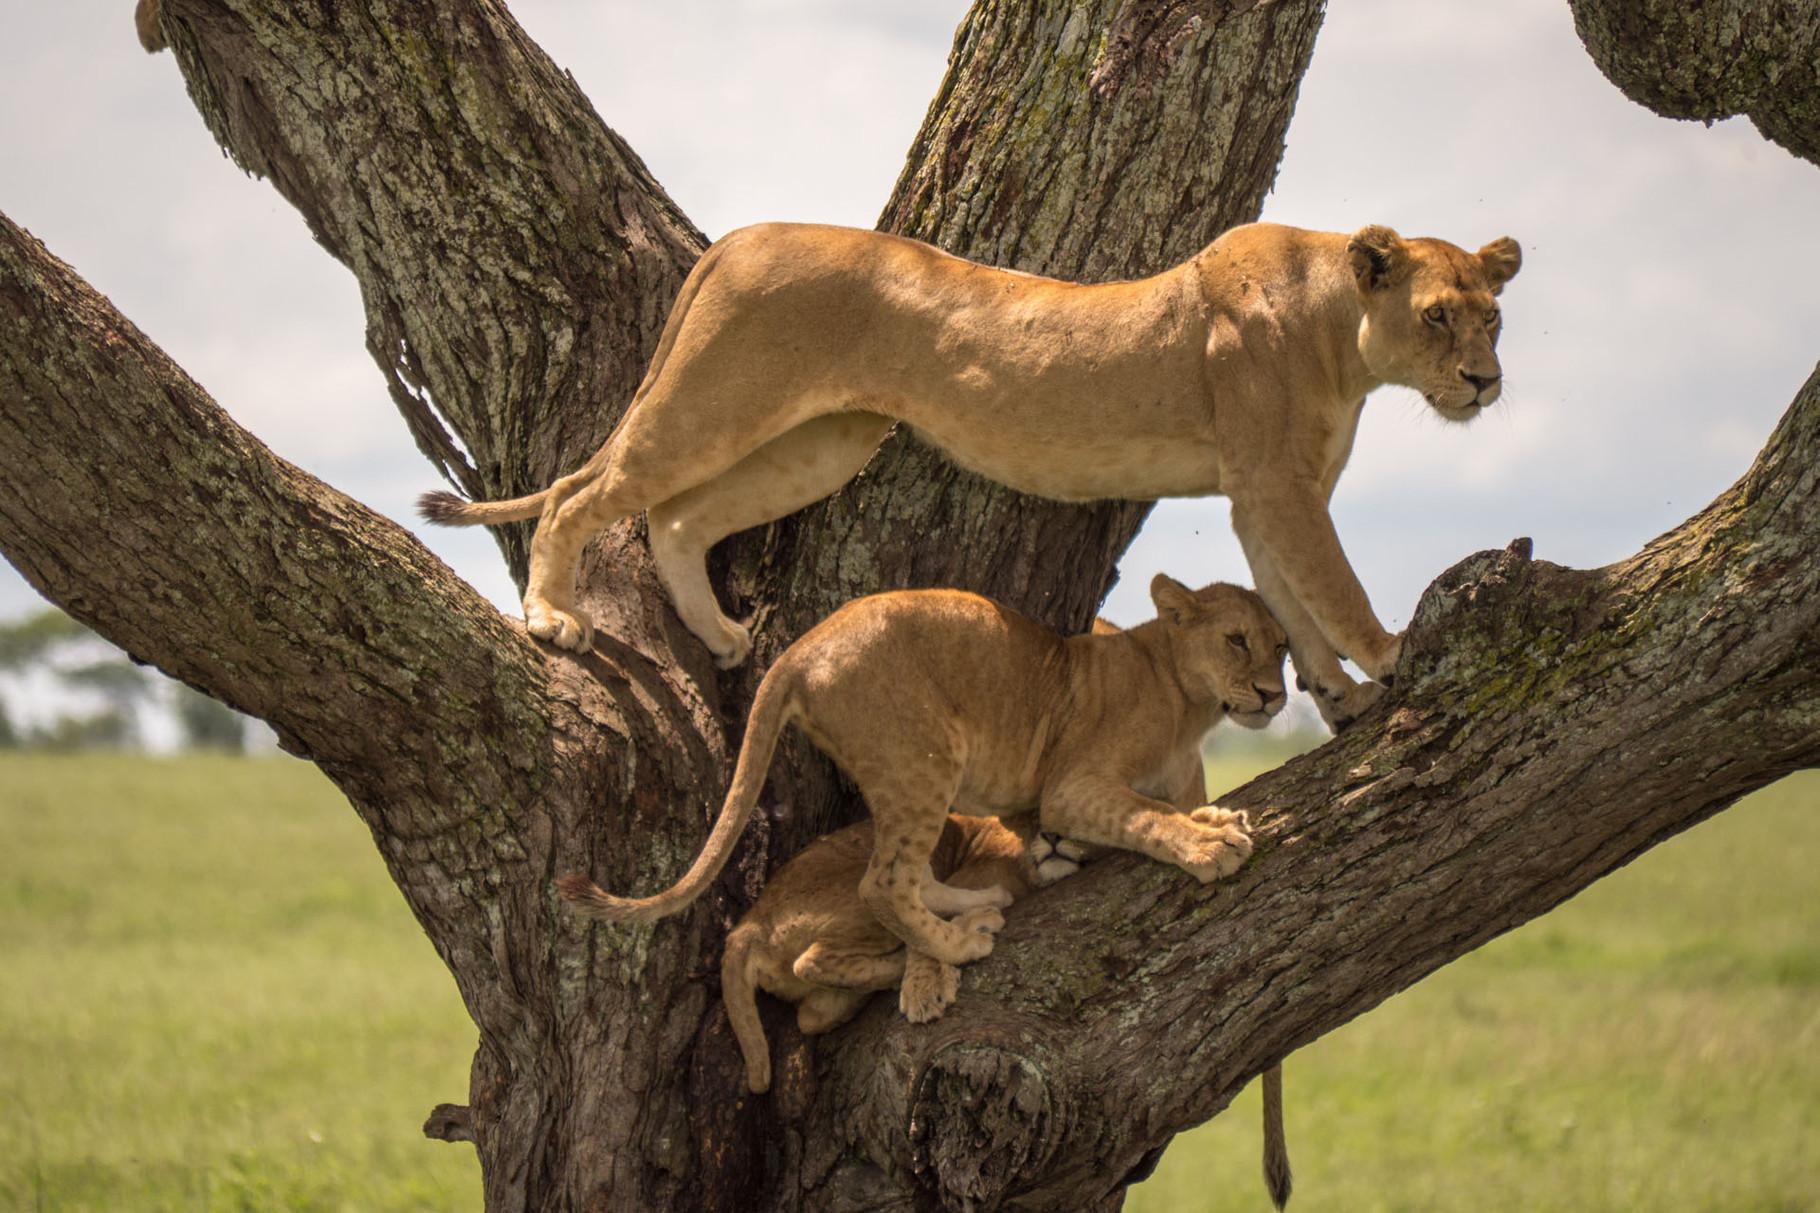 Lions [Serengeti, Tanzania, 2015]